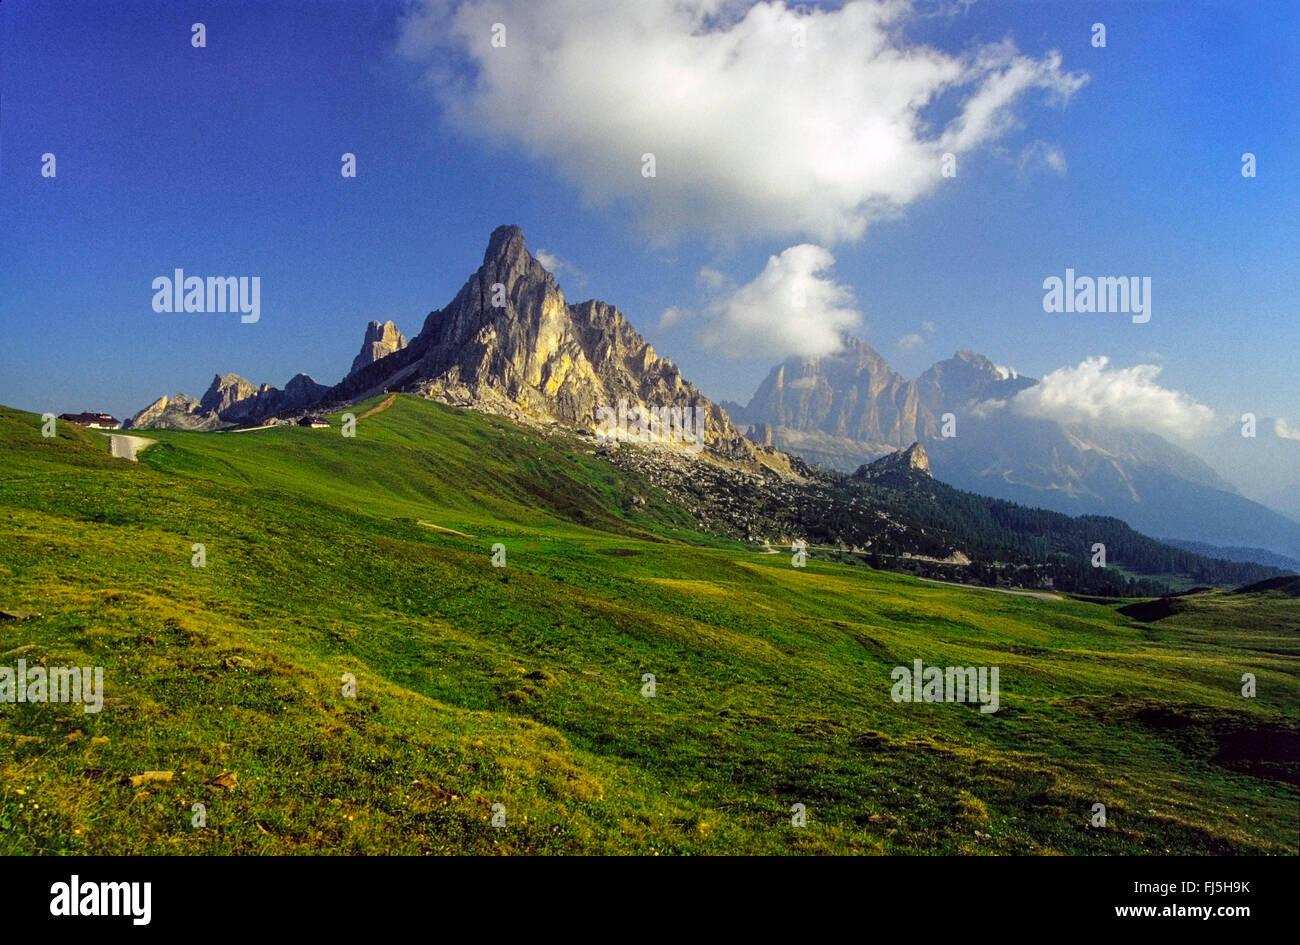 Giau Pass, Italy, South Tyrol, Dolomites - Stock Image